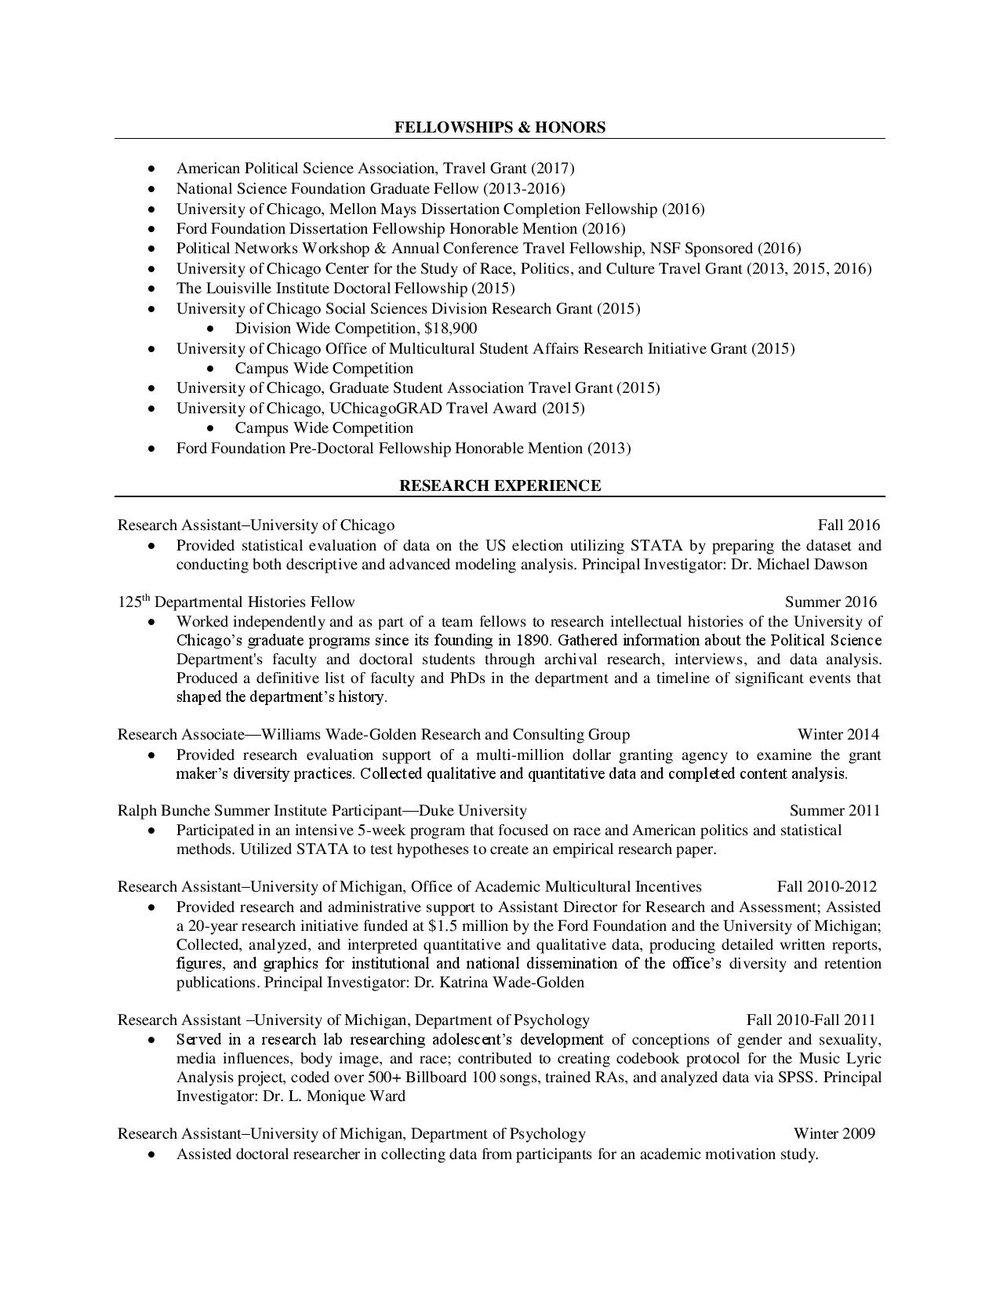 DKU CV public-page-002 (1).jpg